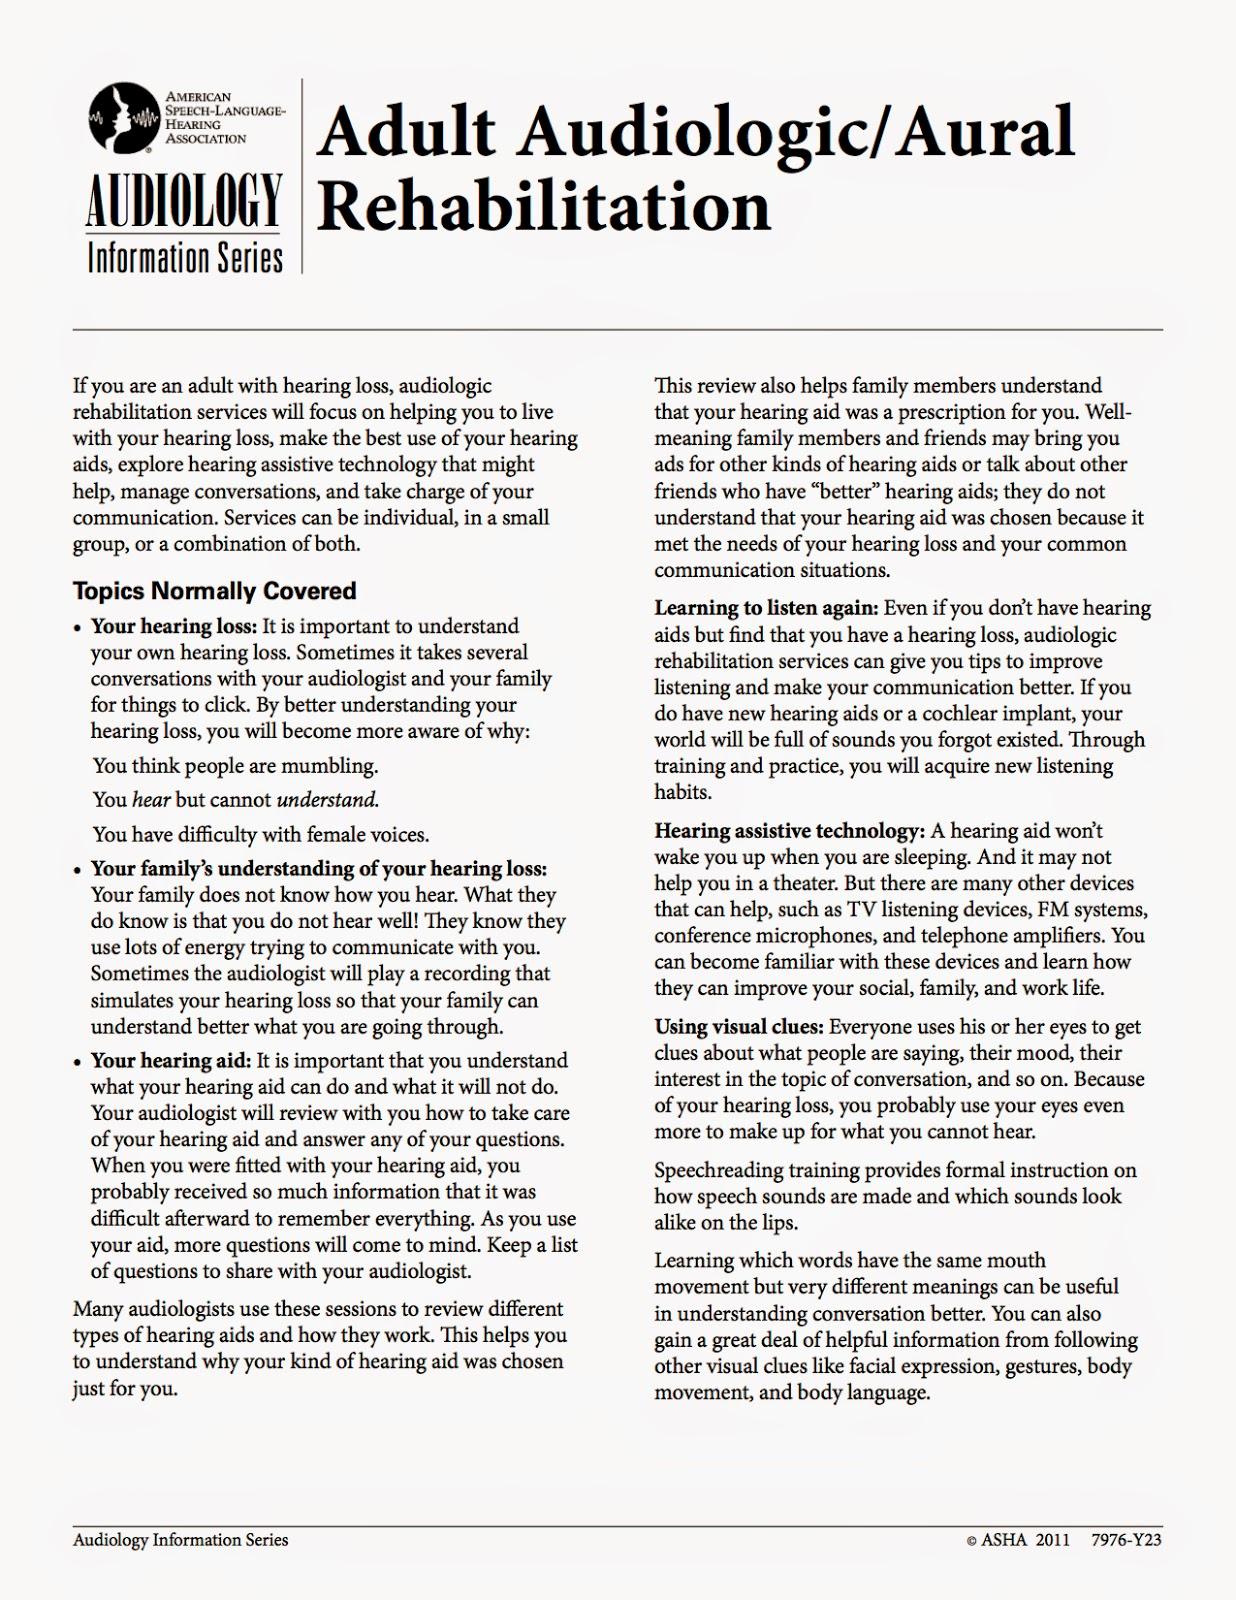 Adult aural rehabiitation pics 403